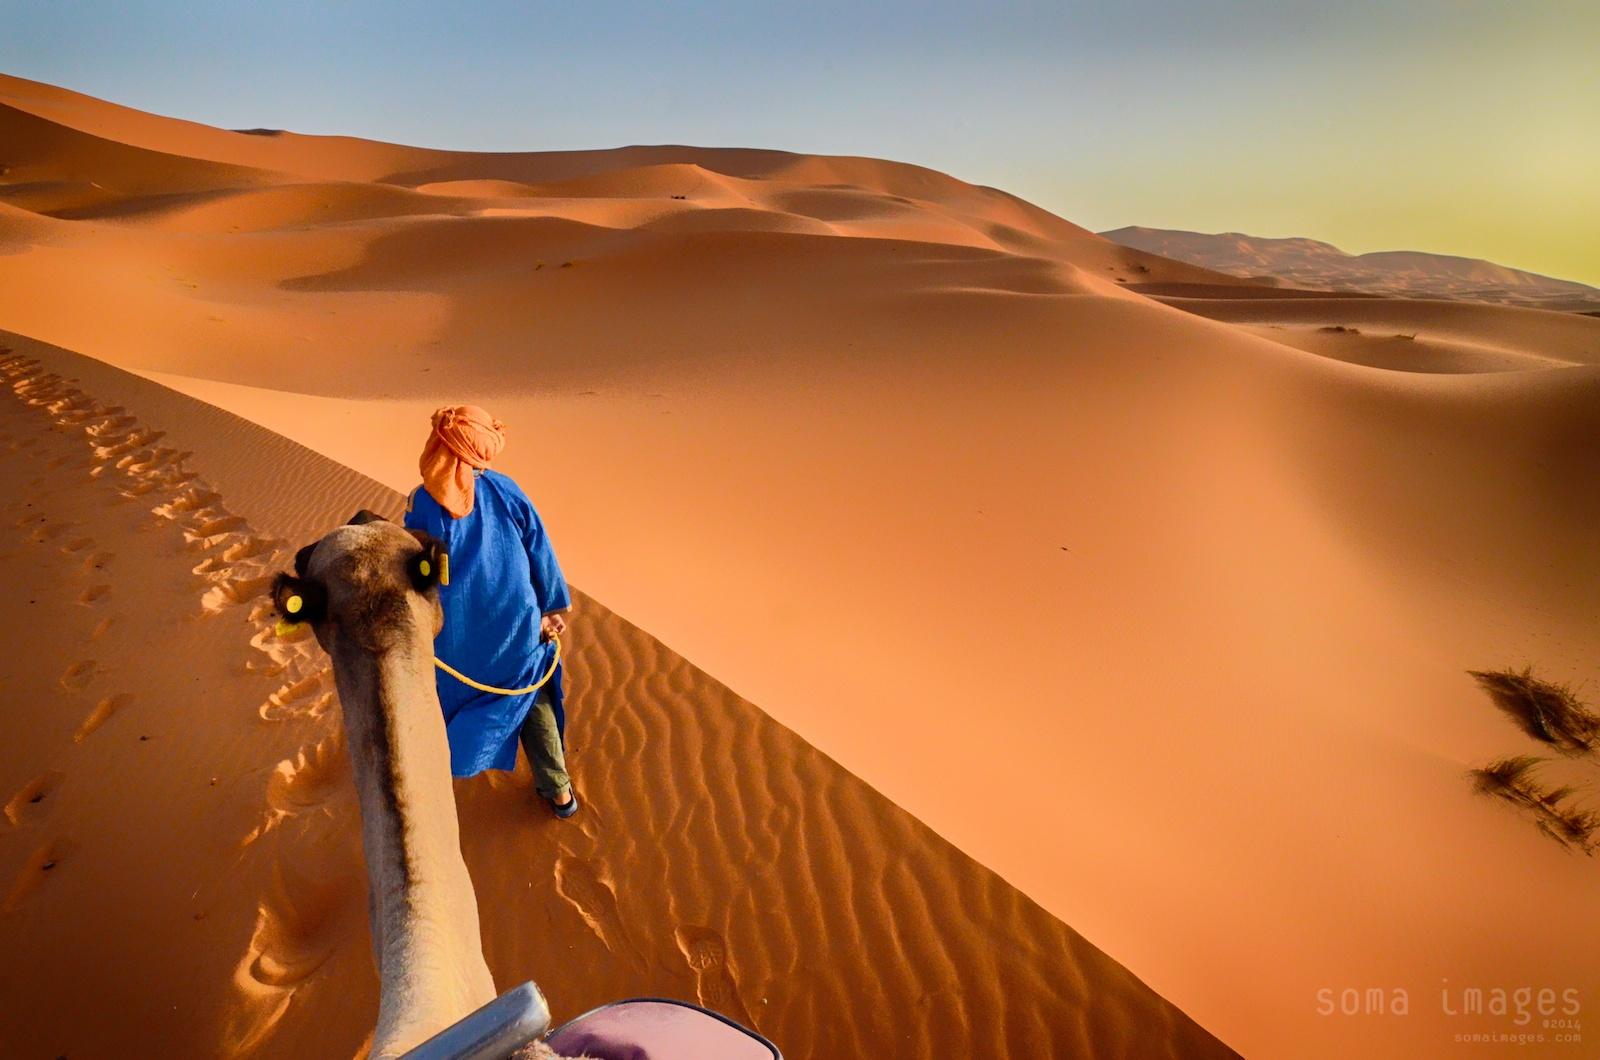 Camels, red sand dunes, Erg Chebbi, Sahara Desert, Morocco